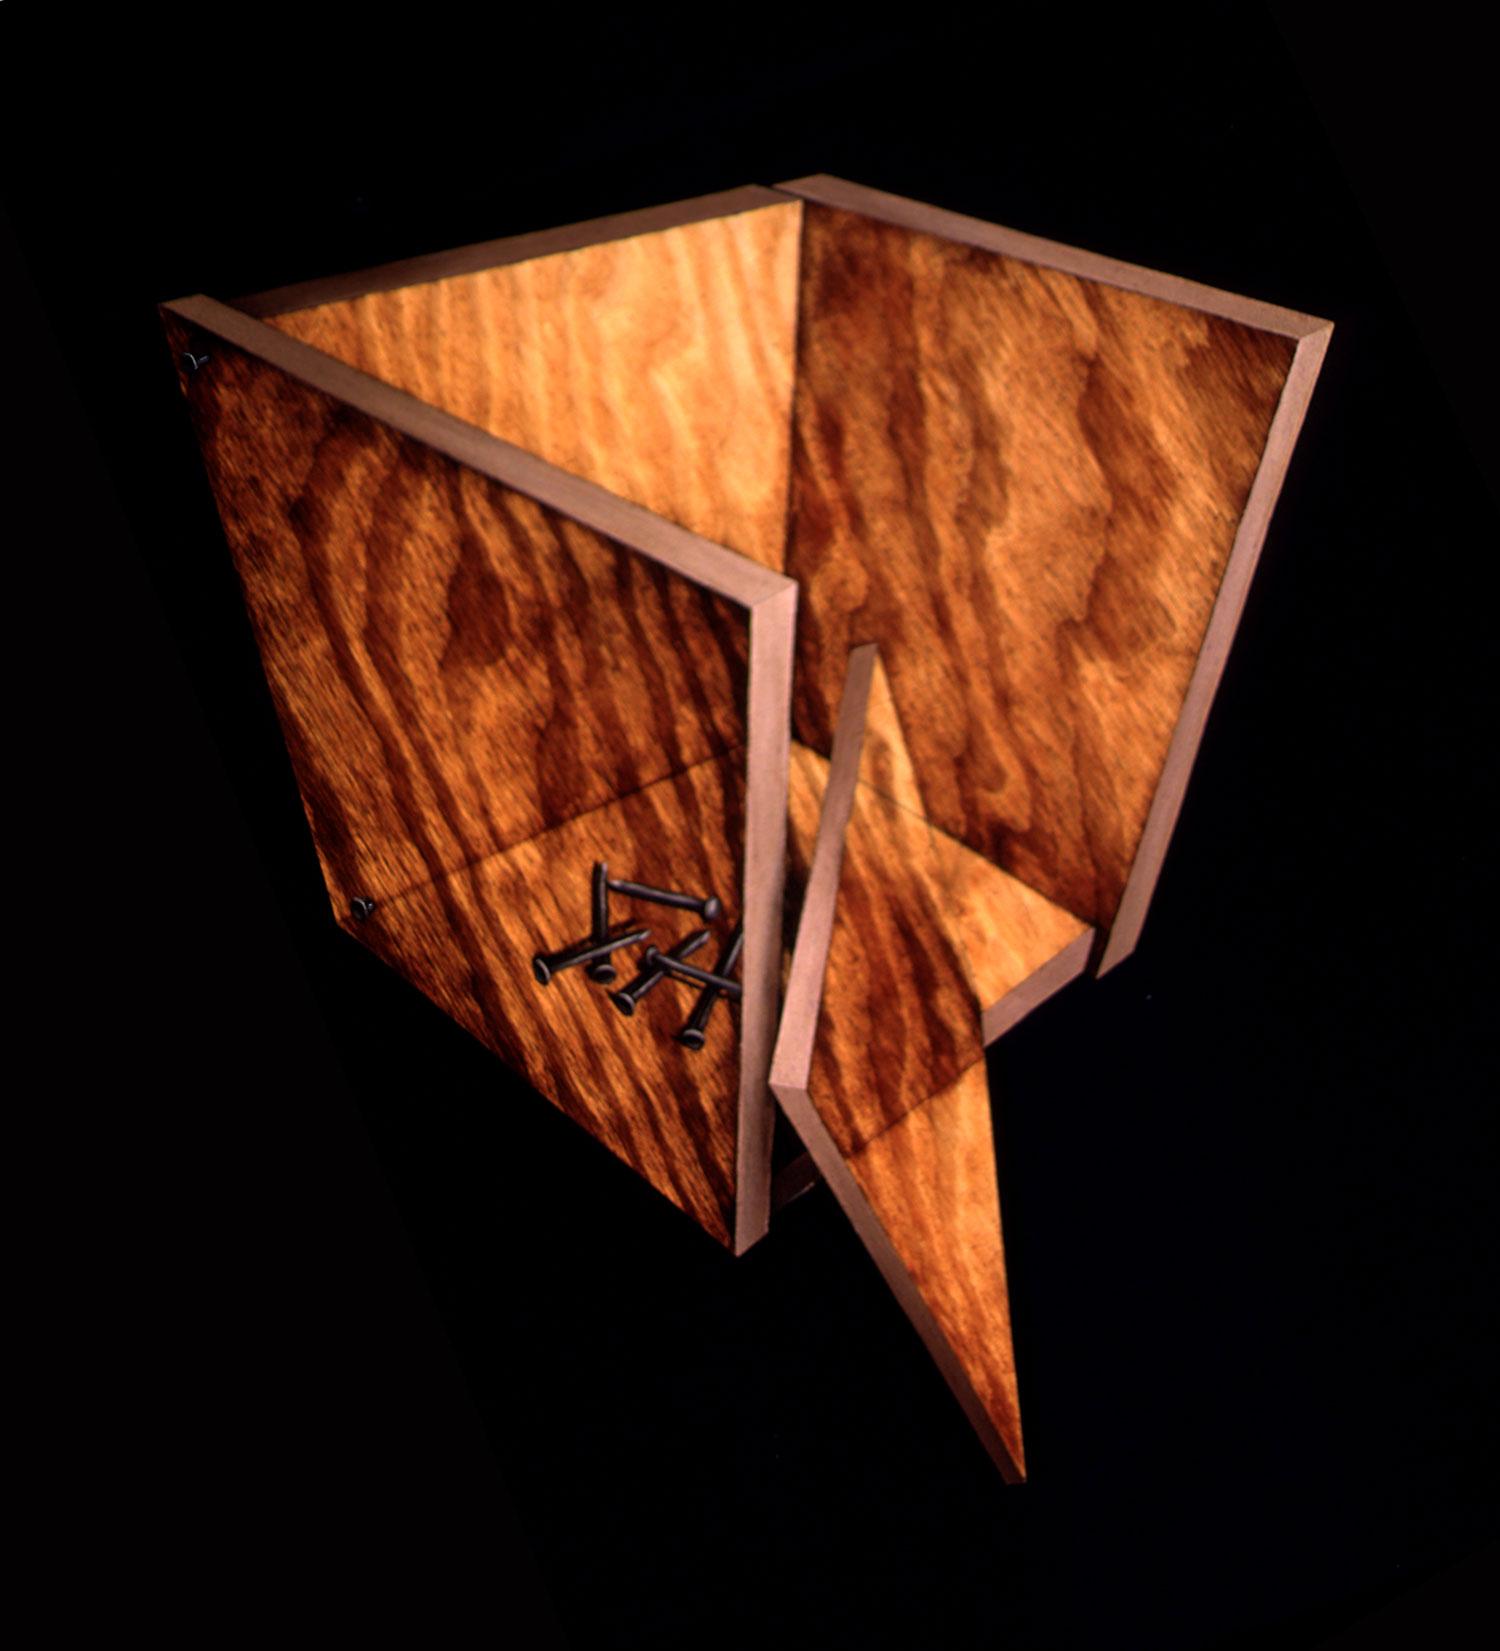 wood-nails.jpg